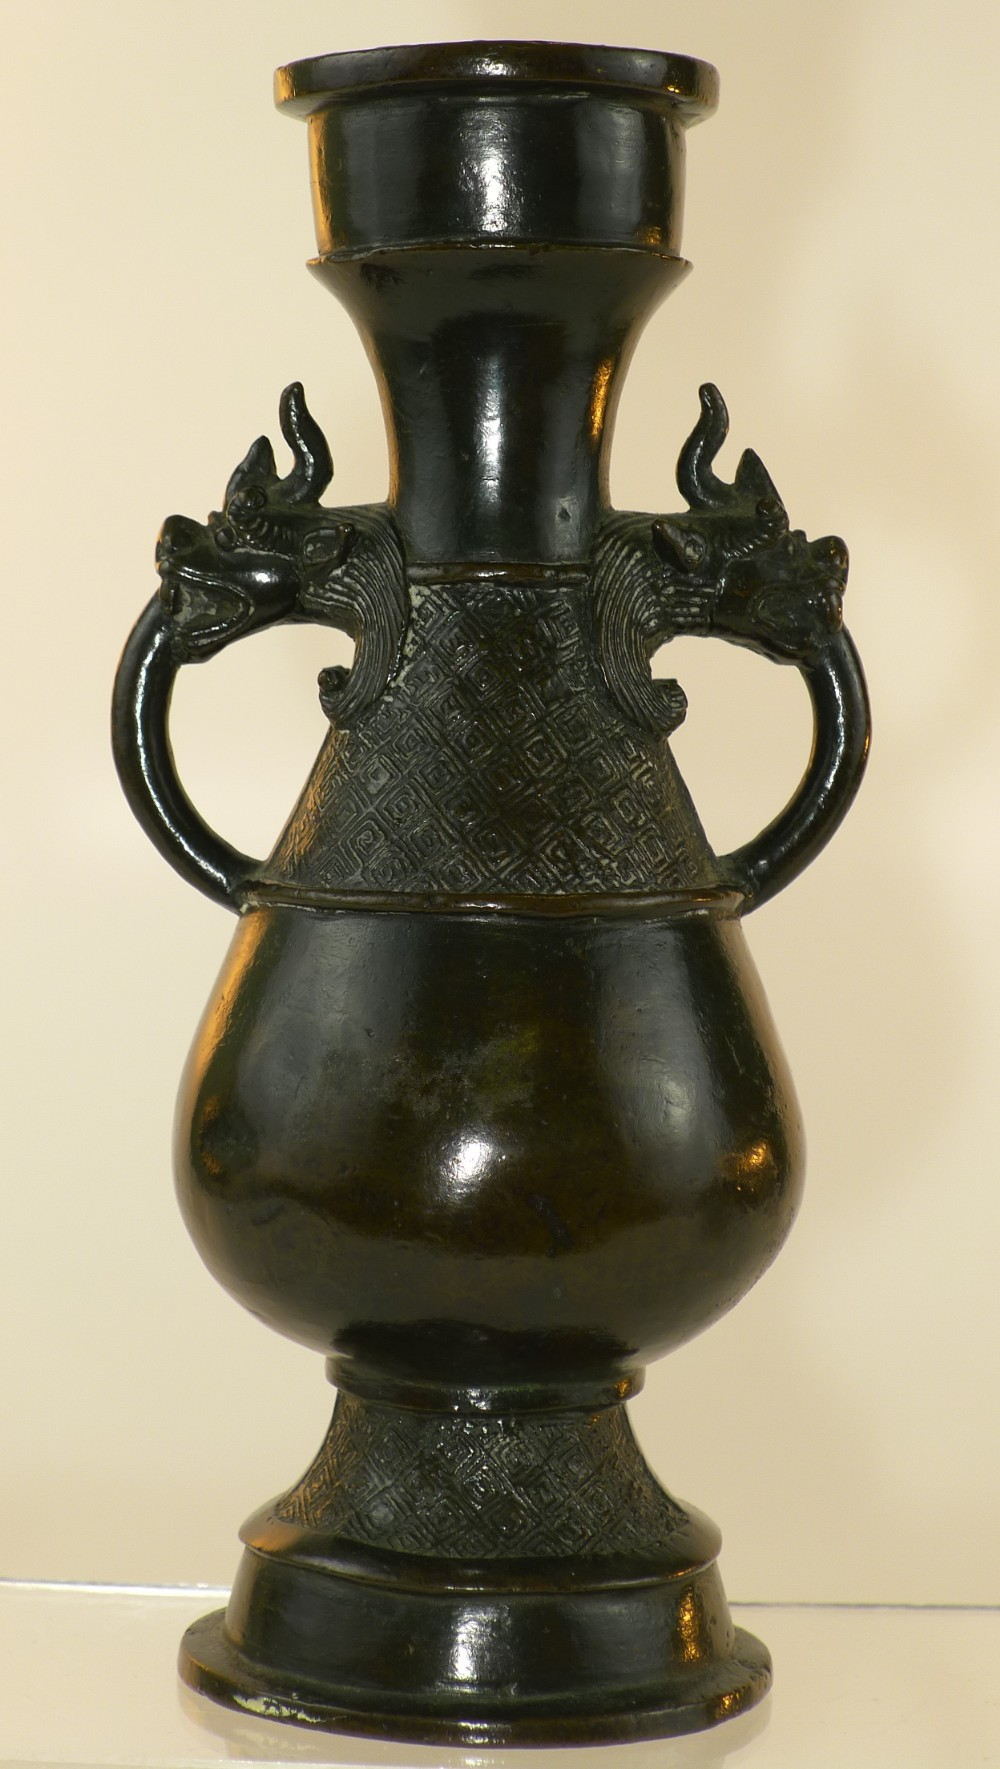 Antique chinese metal vases images antique chinese metal vases antique vase metal reviewsmspy